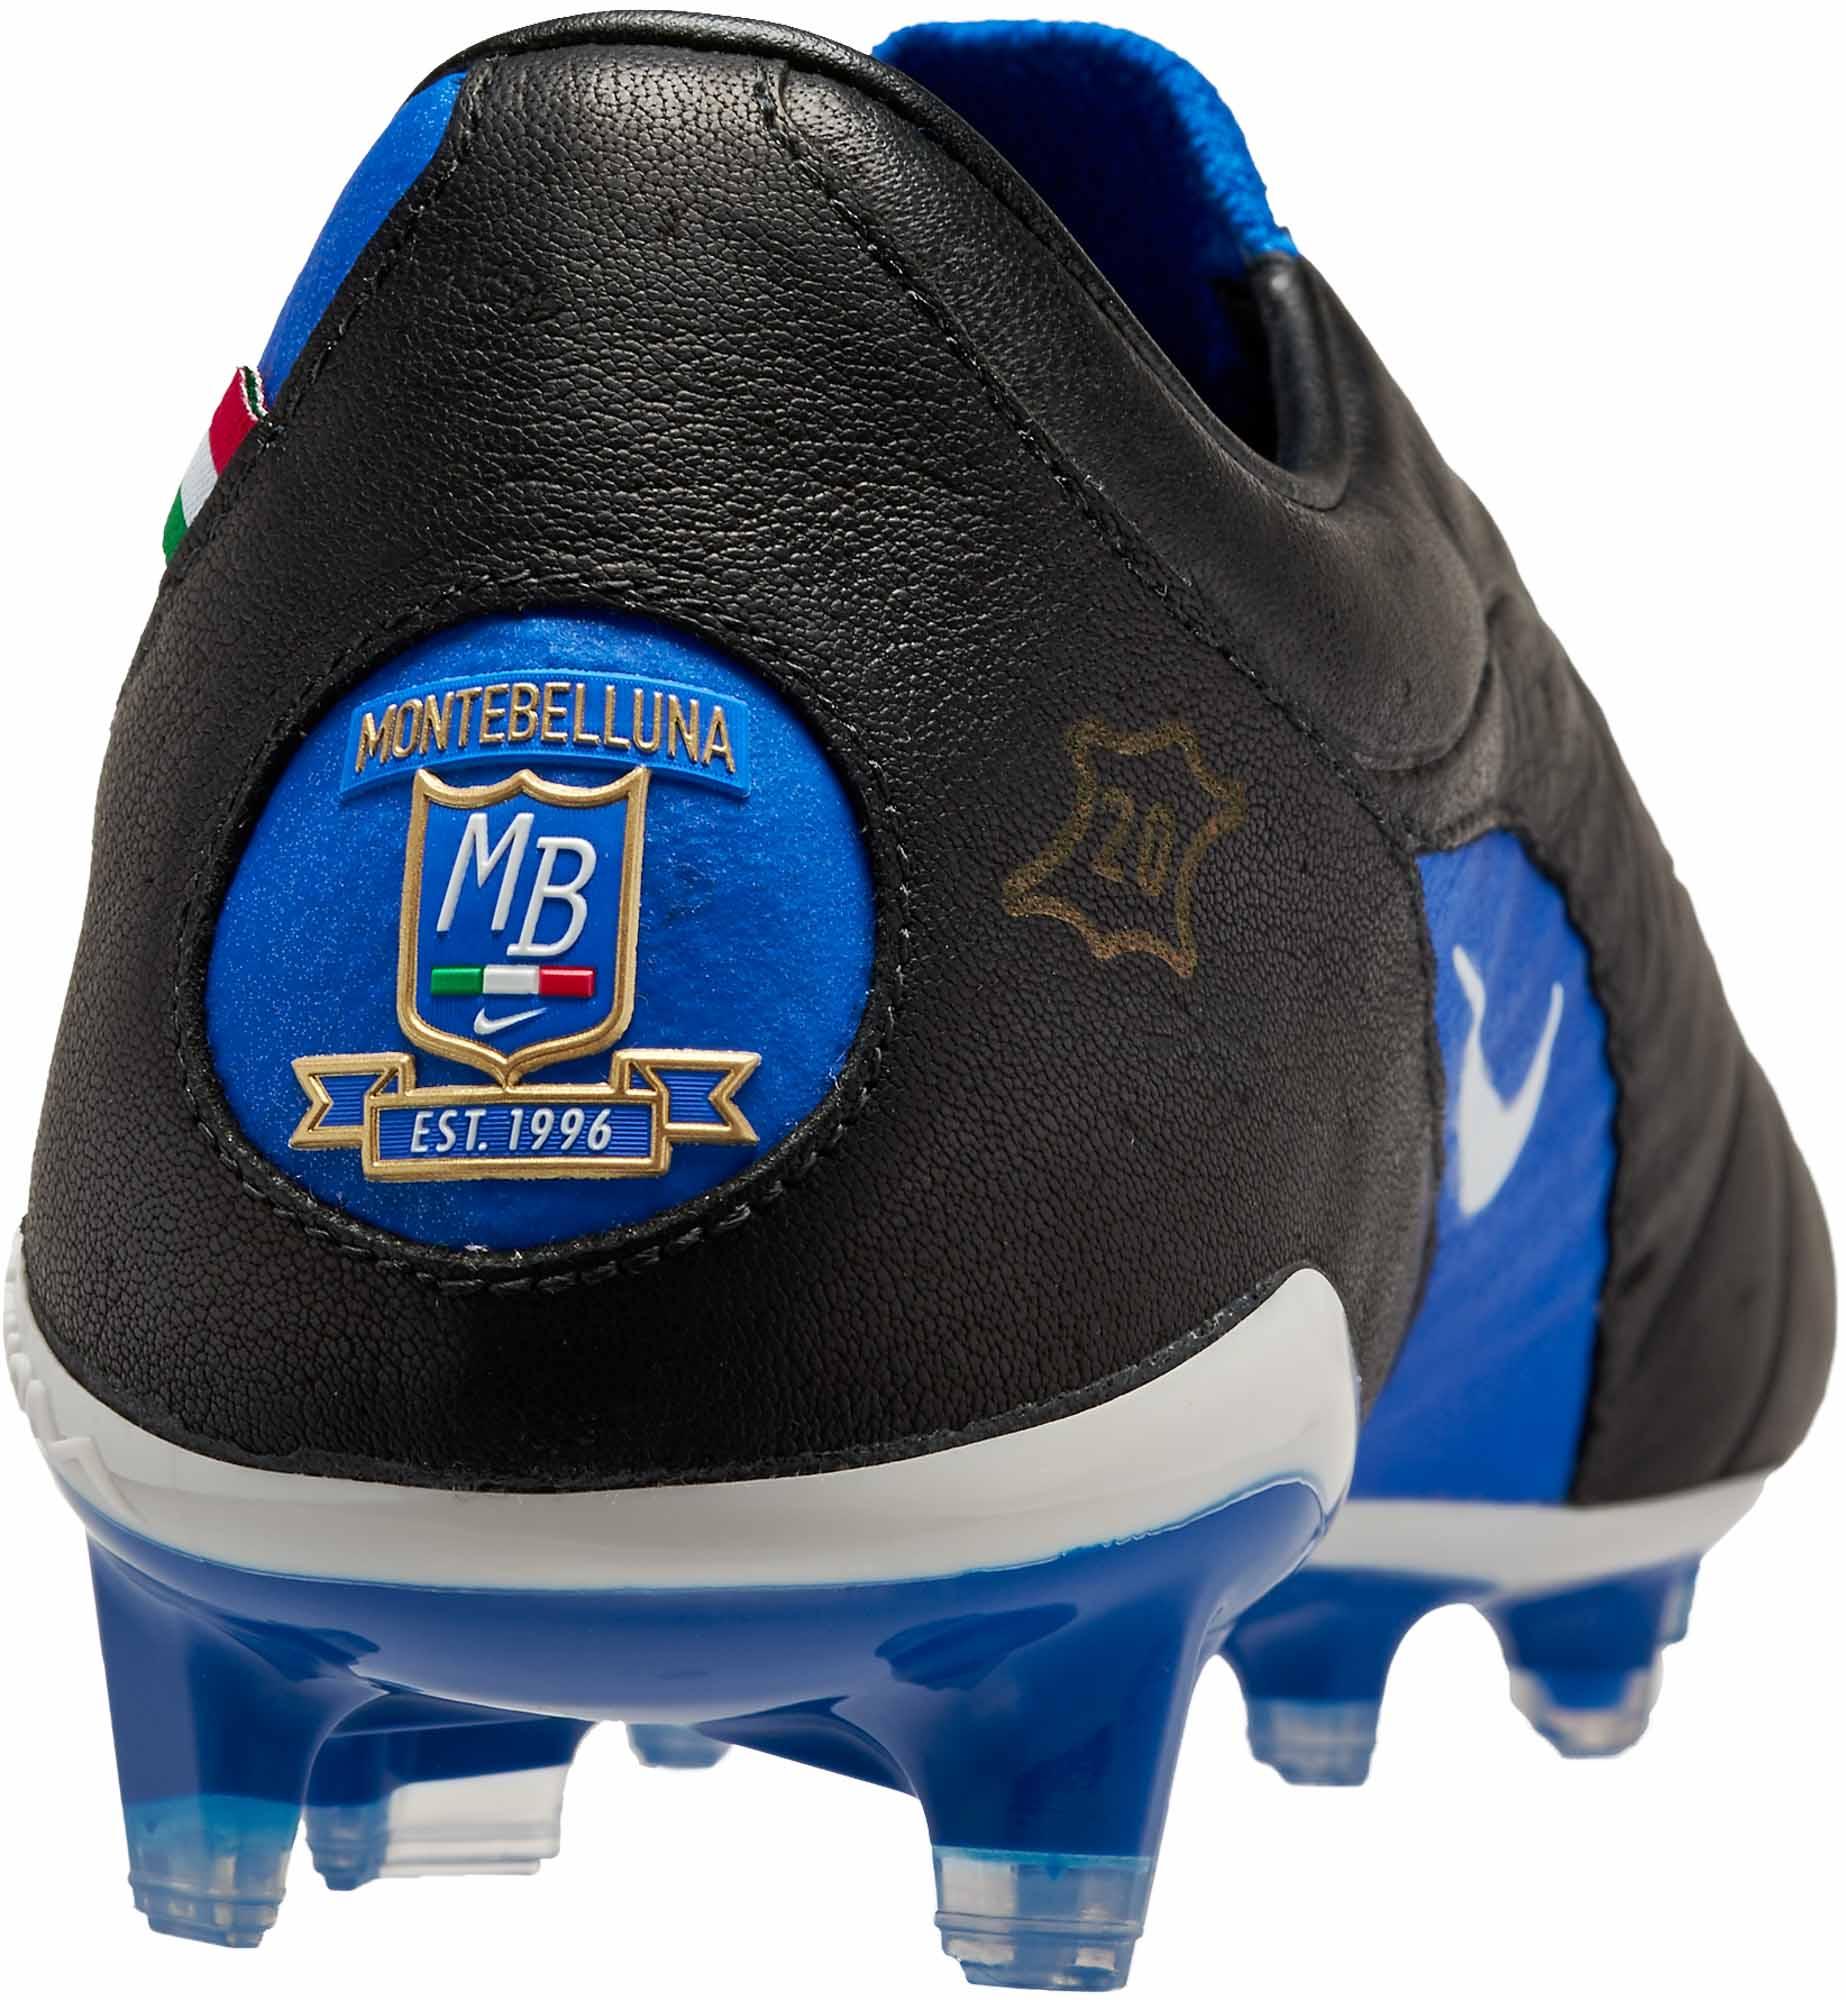 Soportar Escupir Mecánica  Nike Hypervenom Phantom III FG - SE - Black & Game Royal - Soccer Master